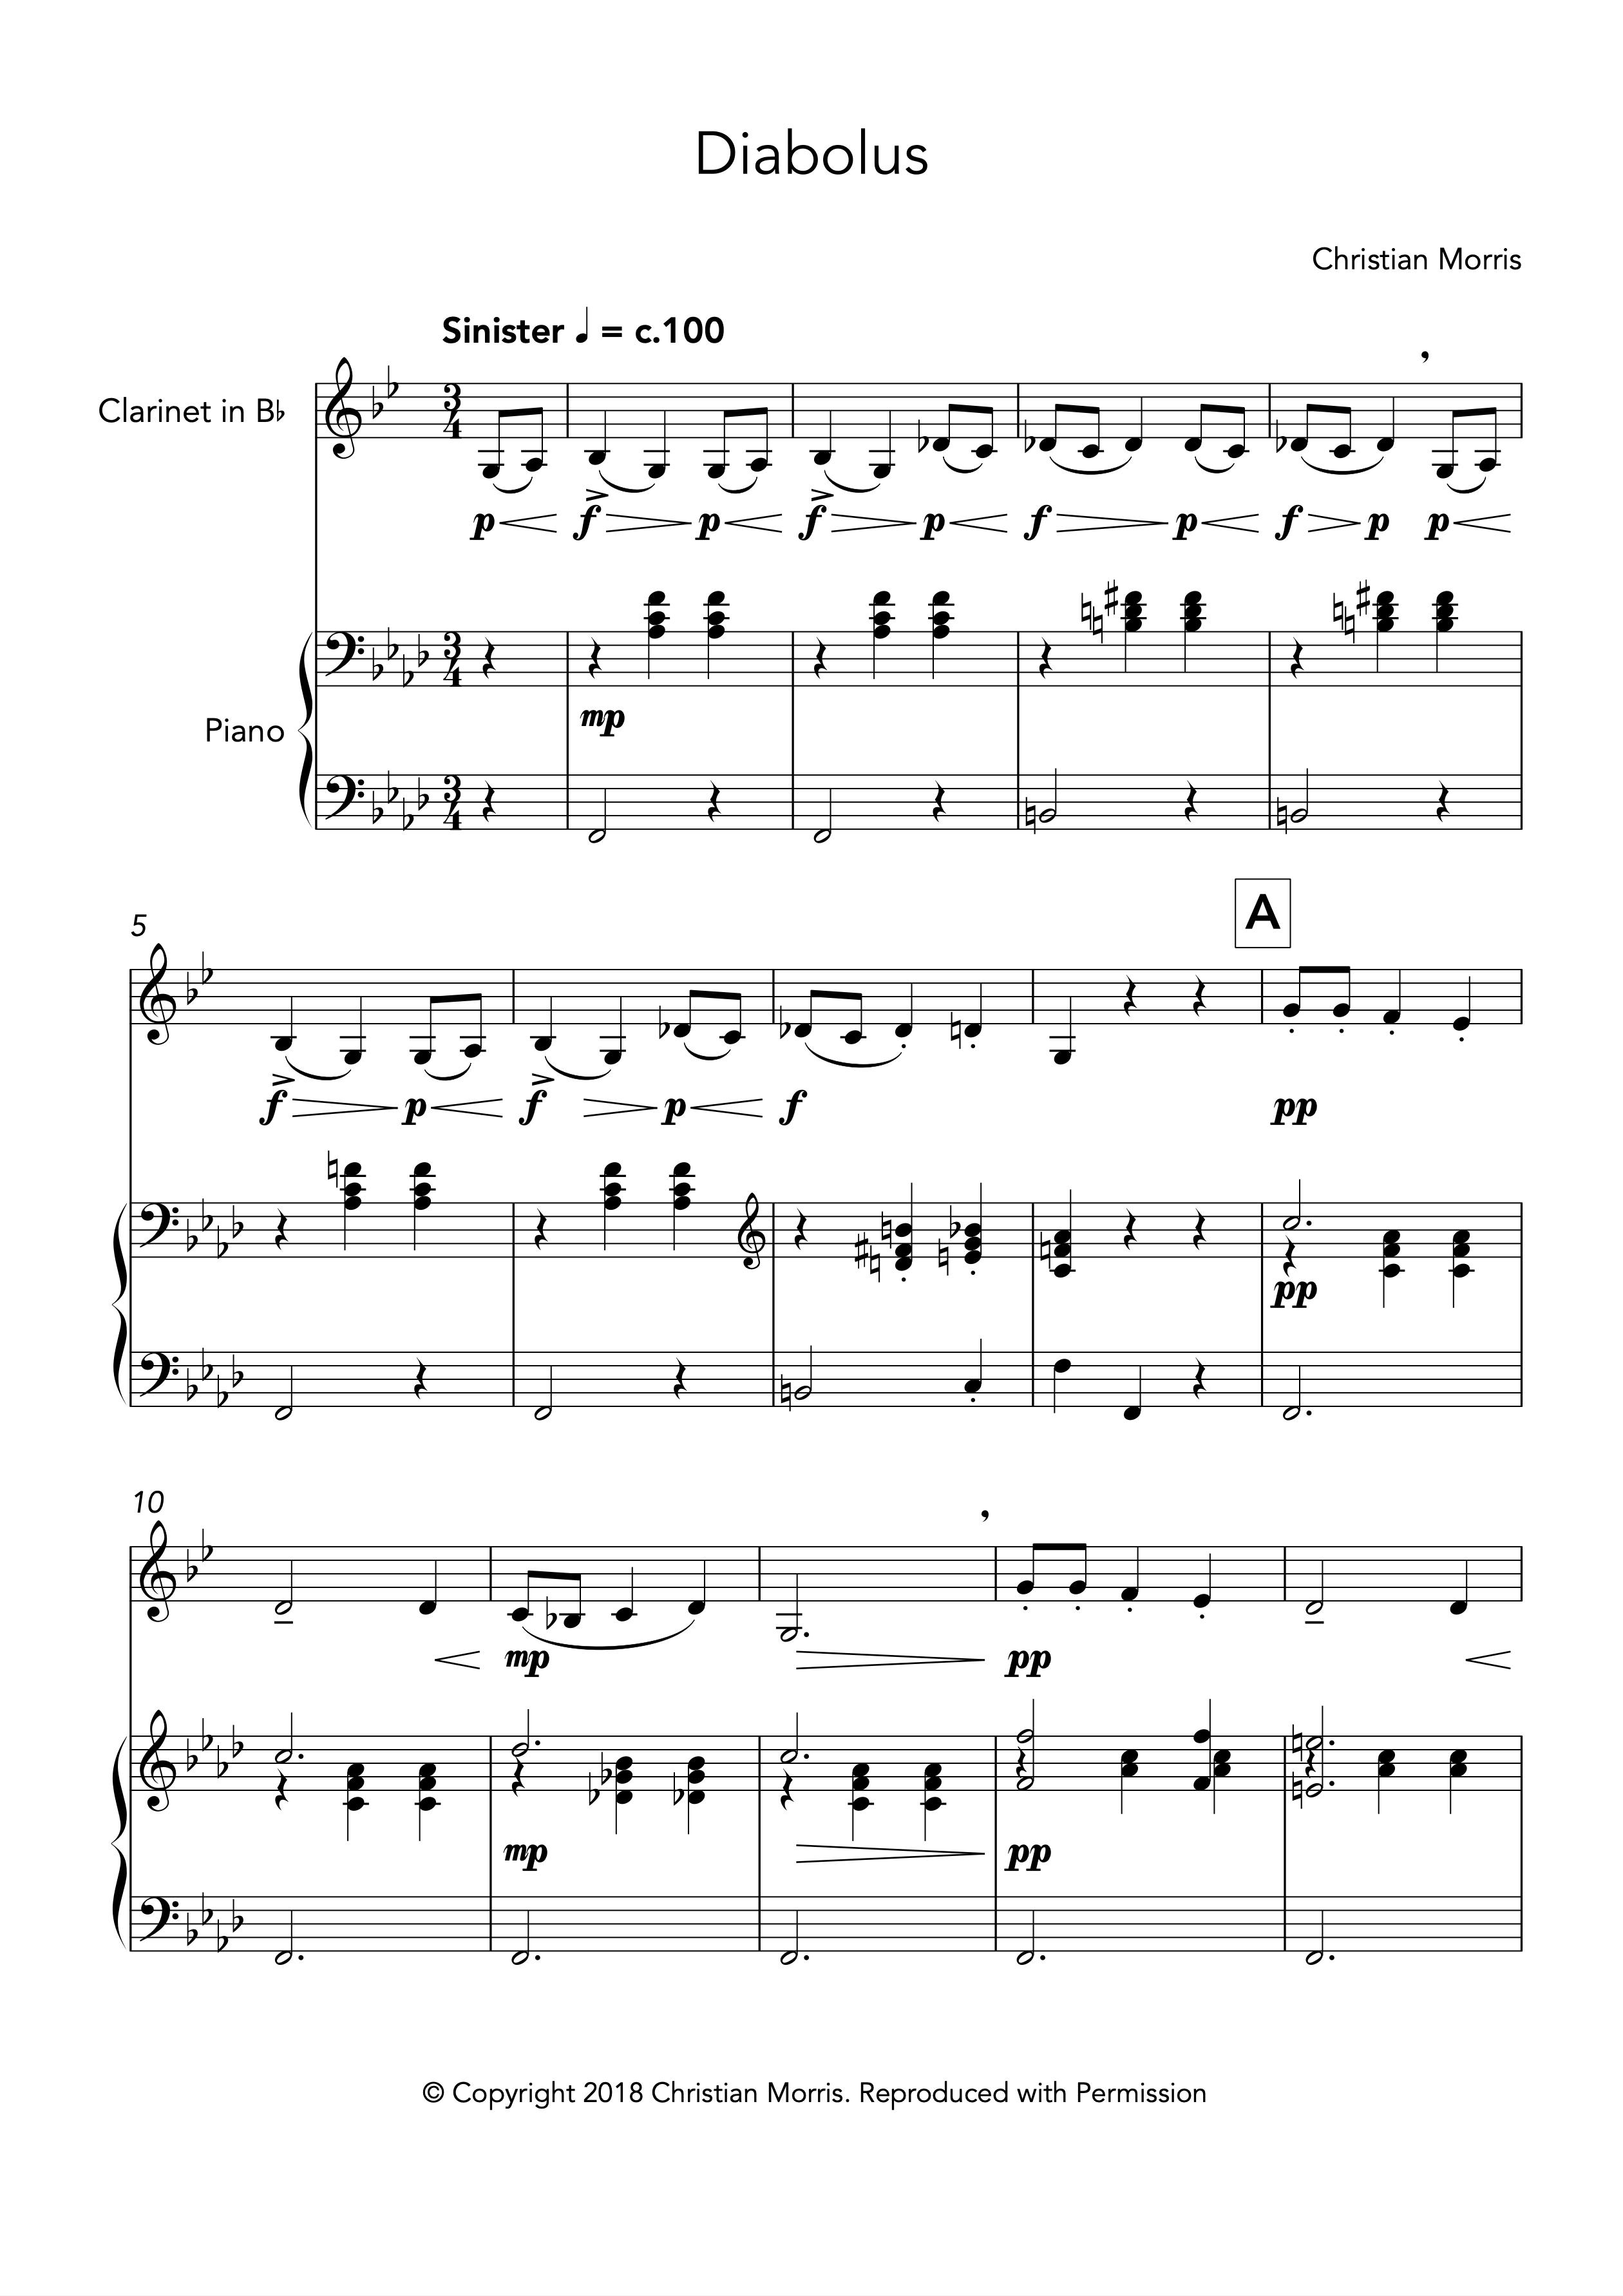 Diabolus (Clarinet and Piano)